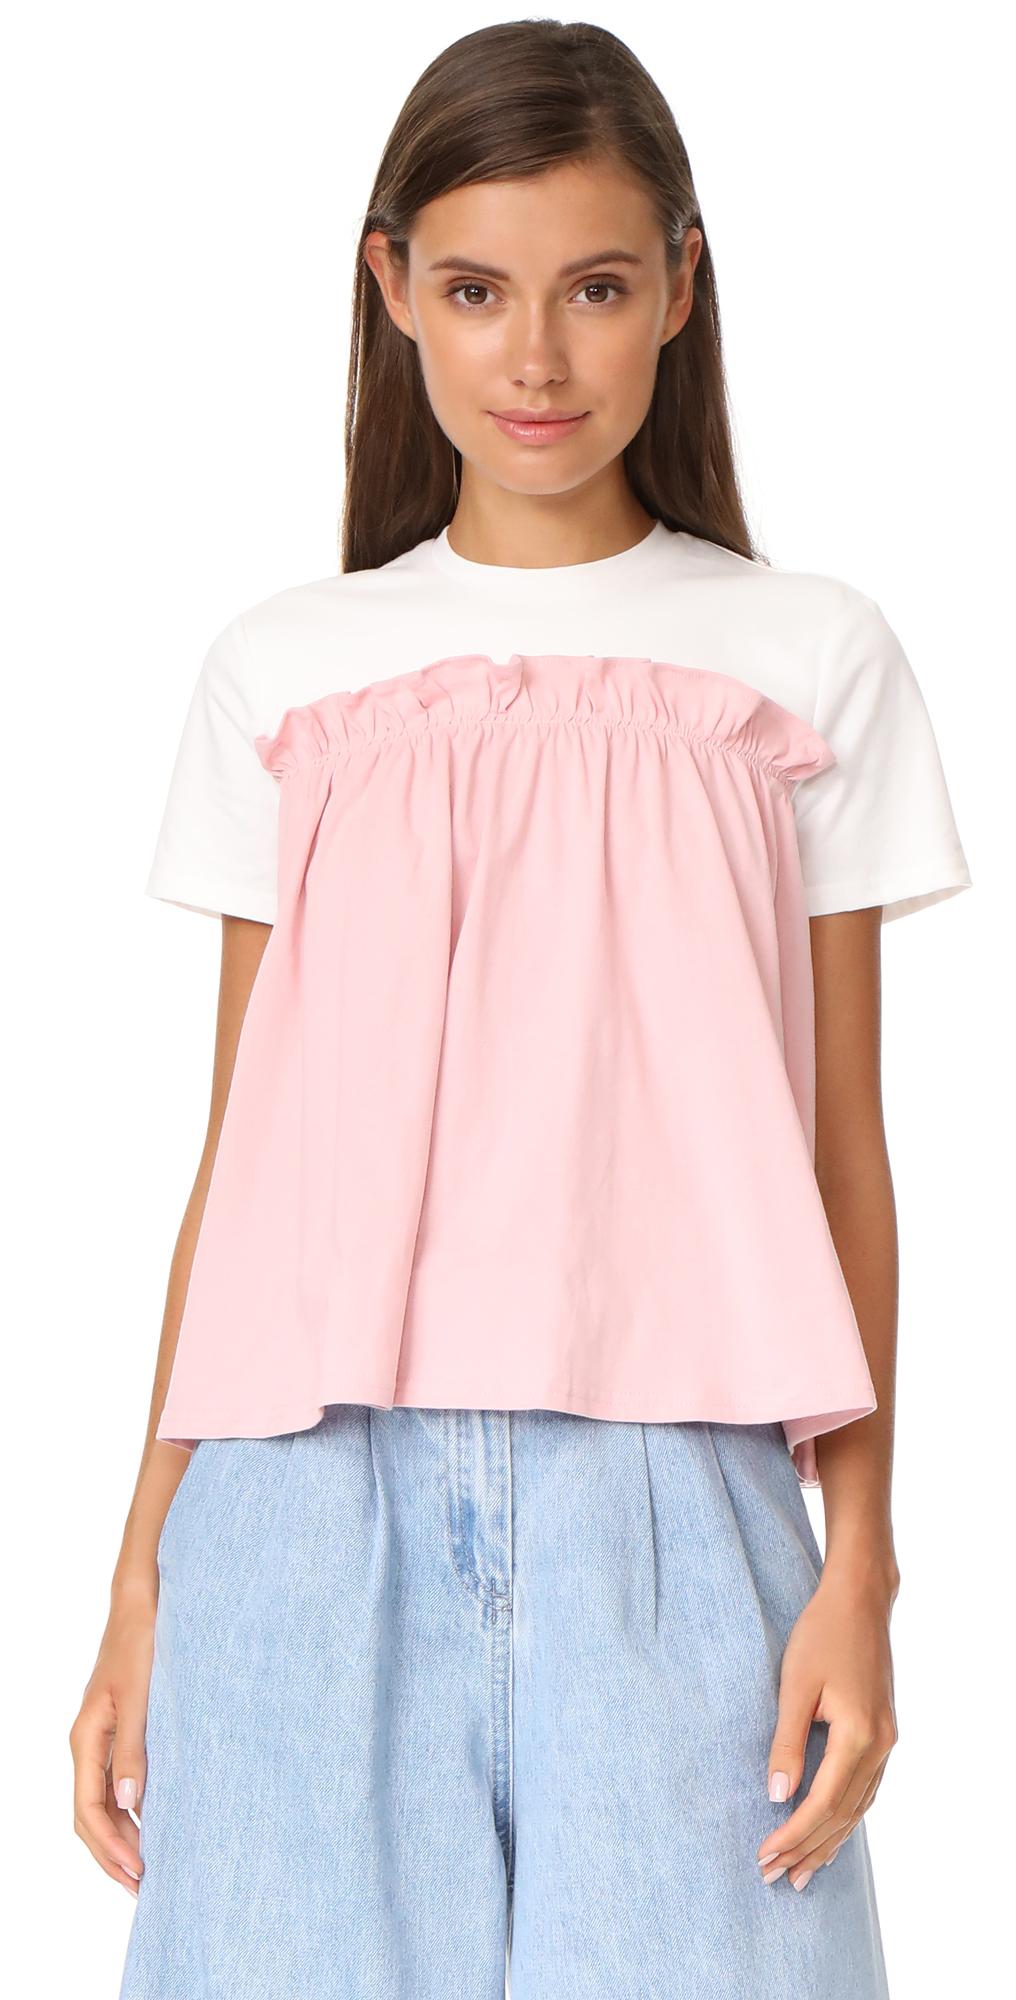 T-Shirt EDIT